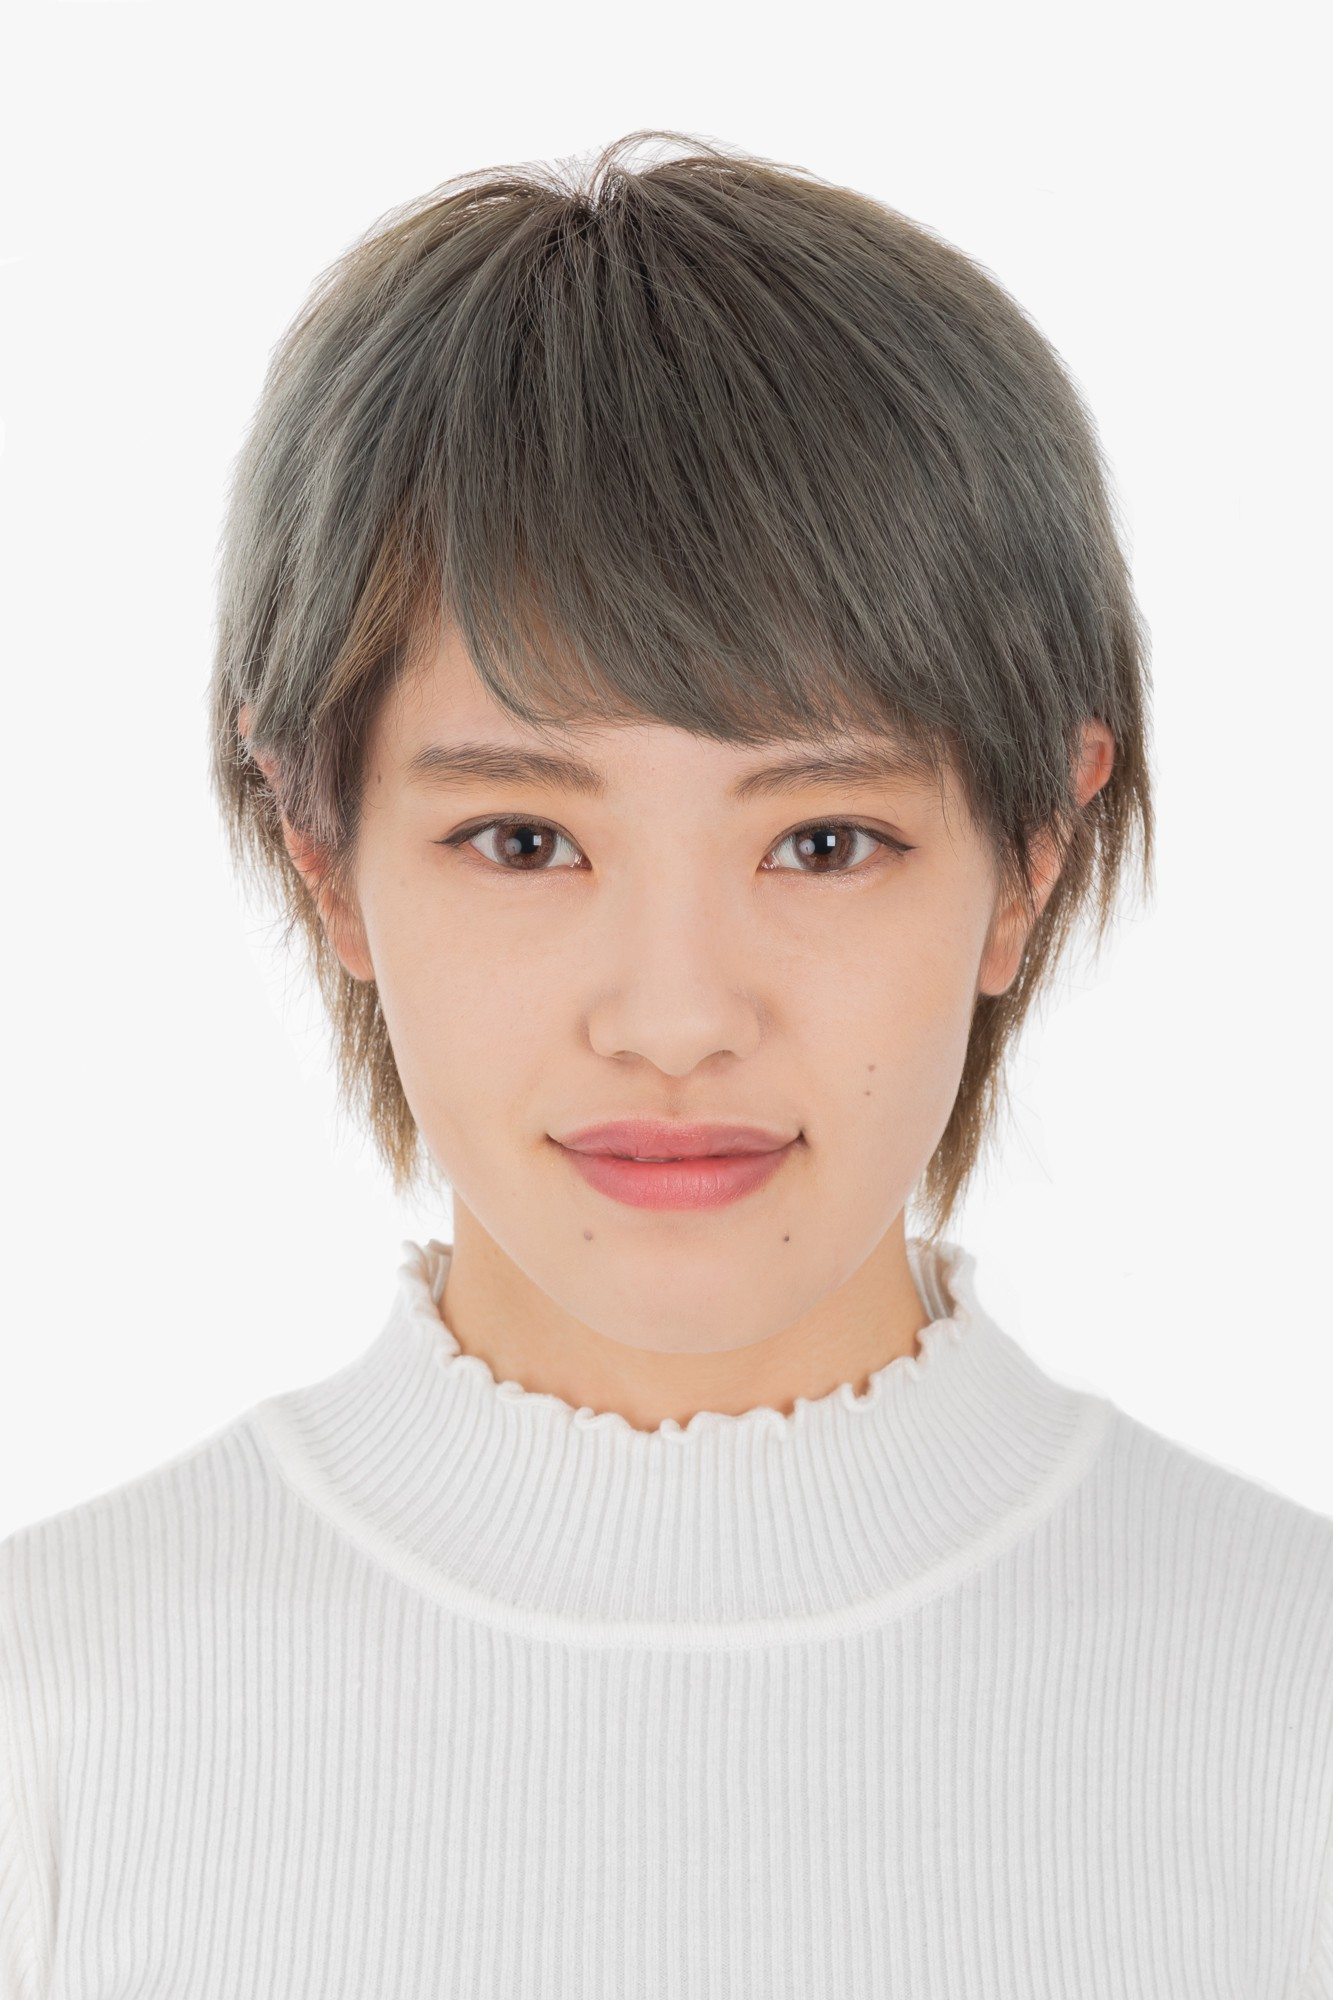 小島鈴佳,KojimaReika